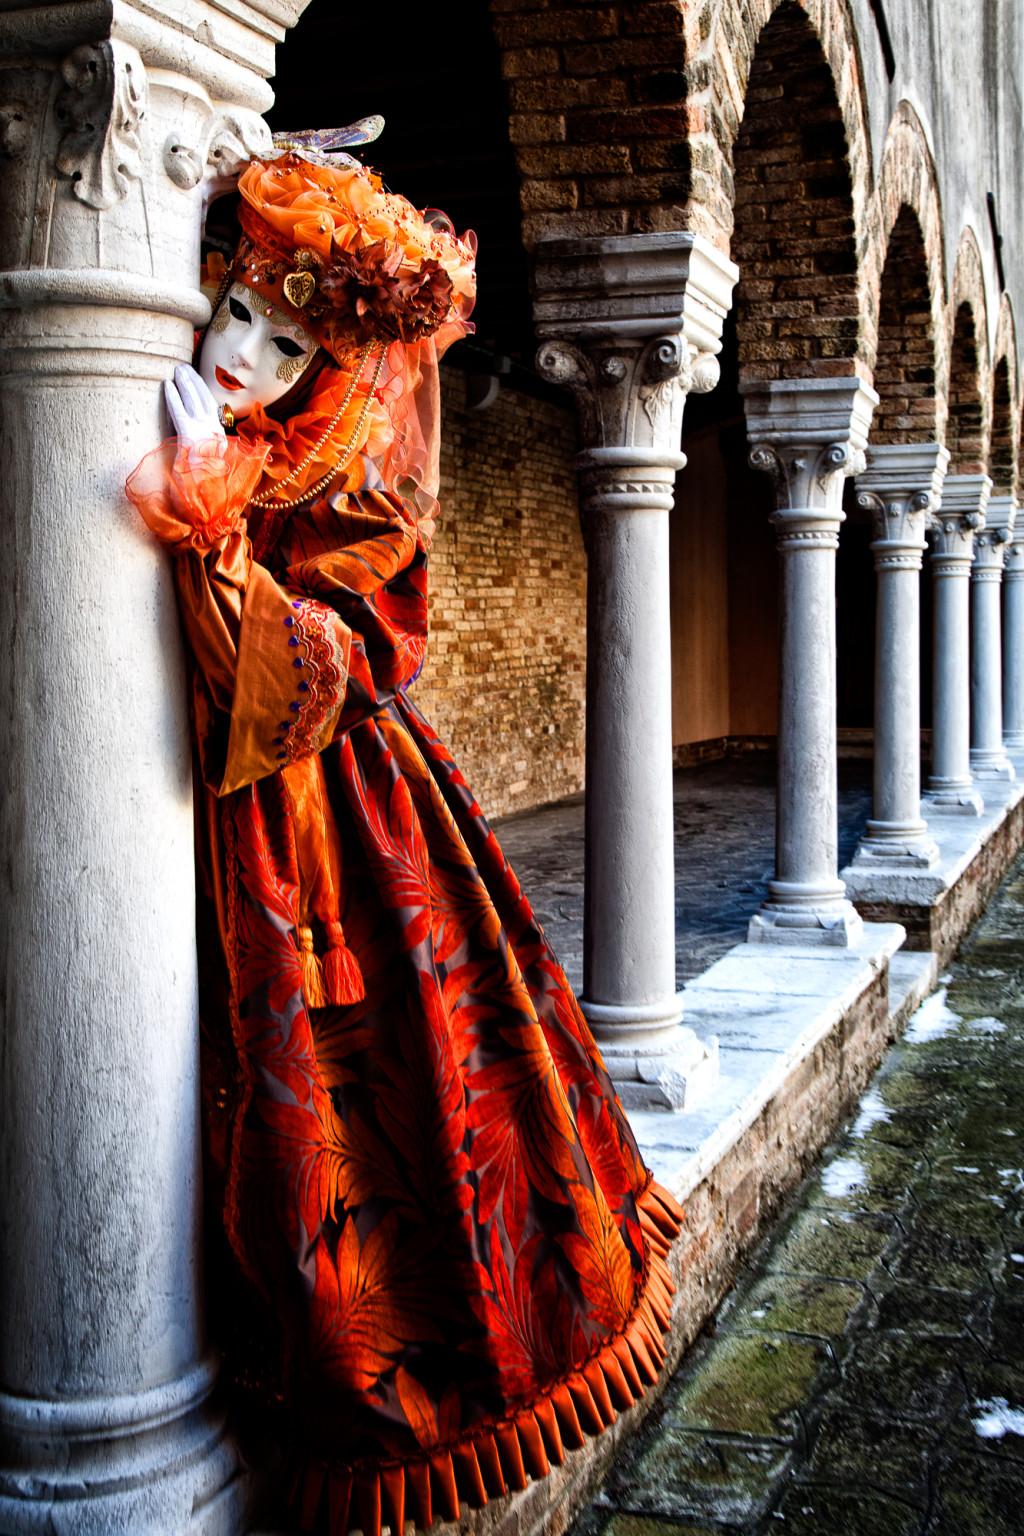 Carnival model in an orange costume by pillars